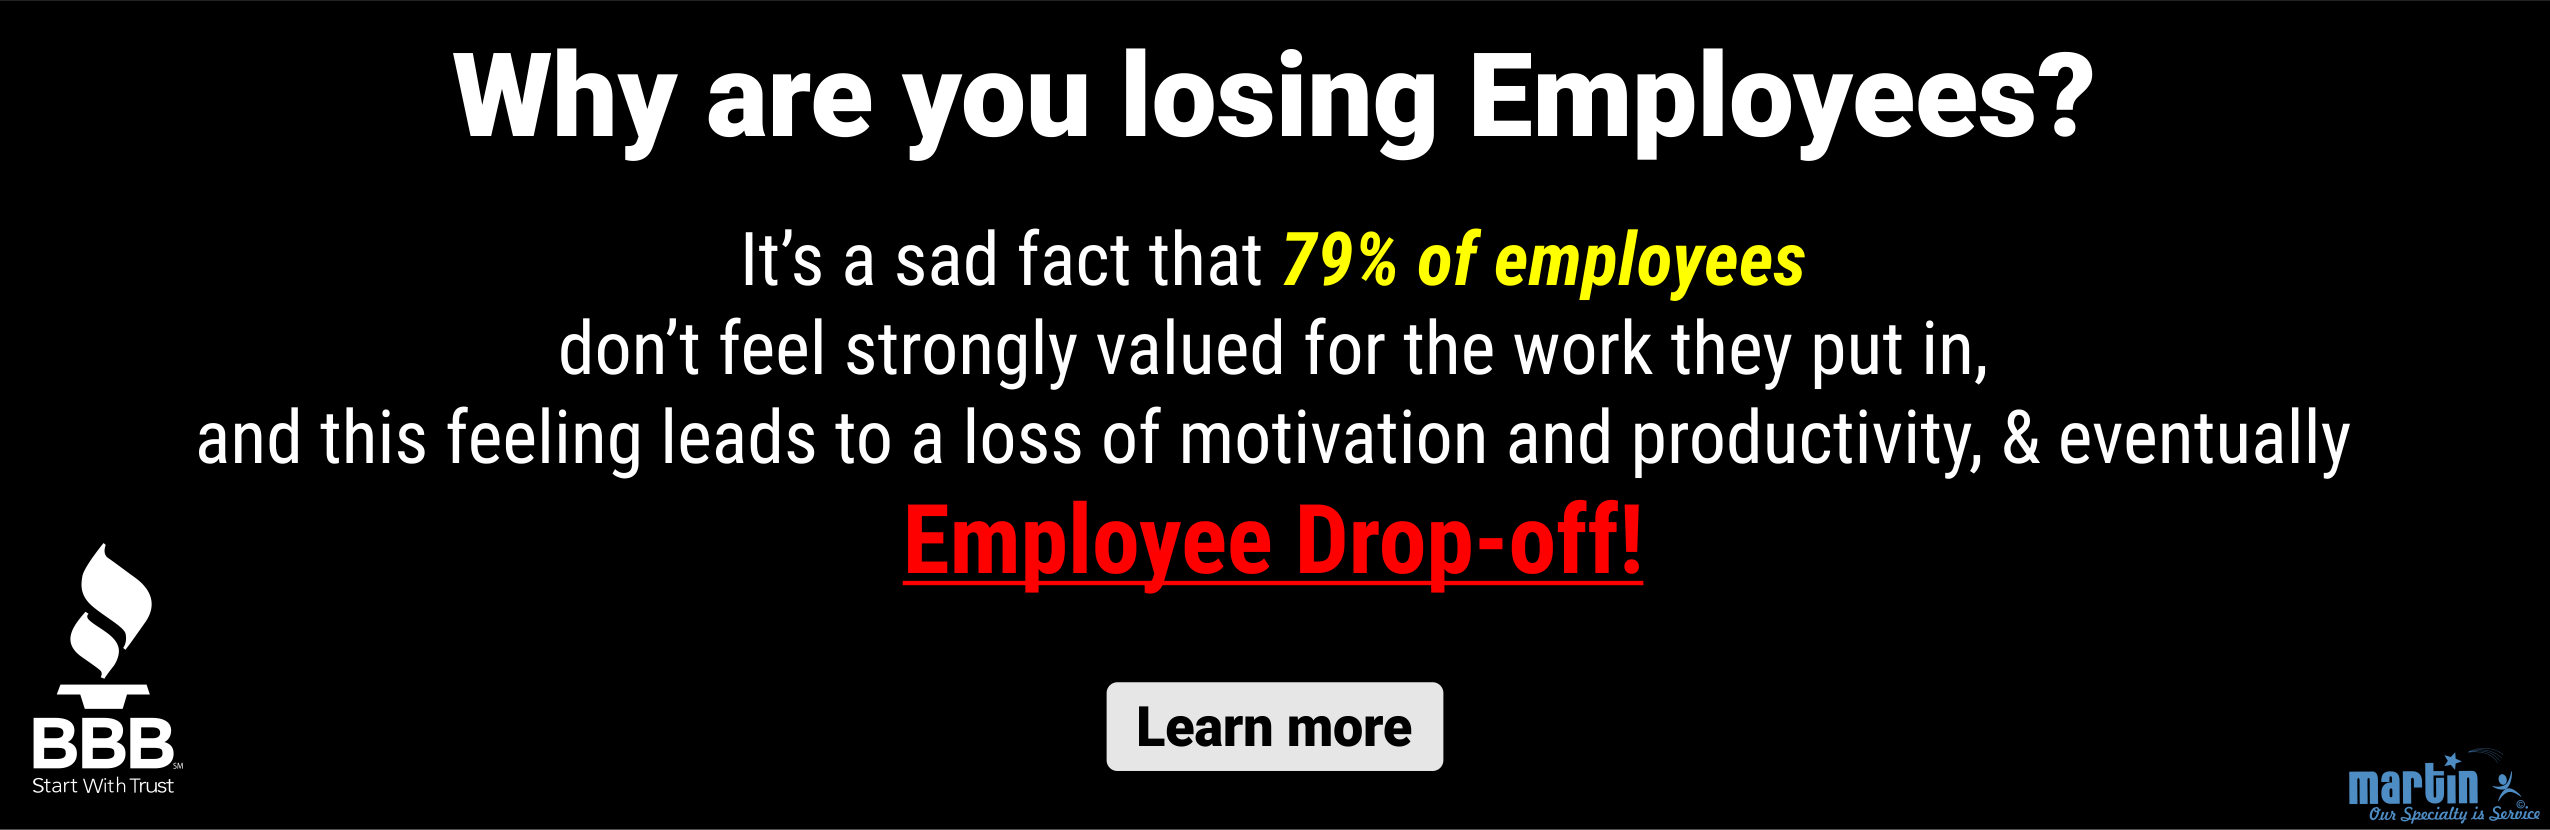 Losing employees